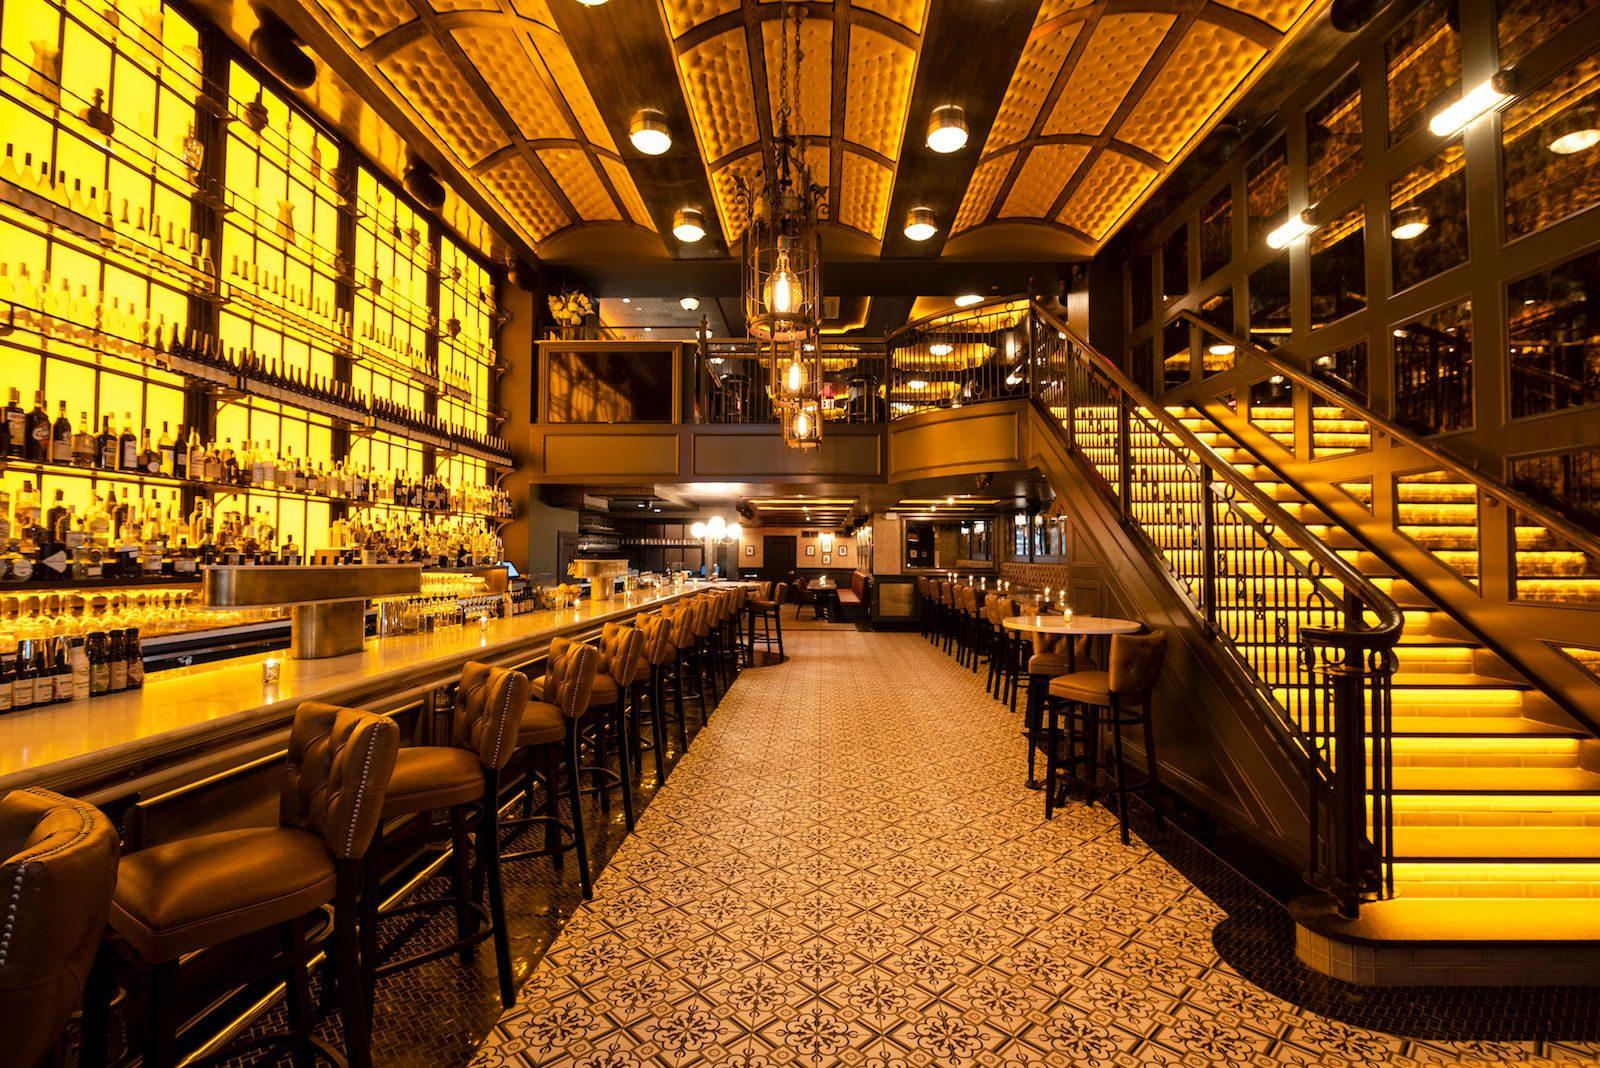 Einblick in die Bar Valerie in New York